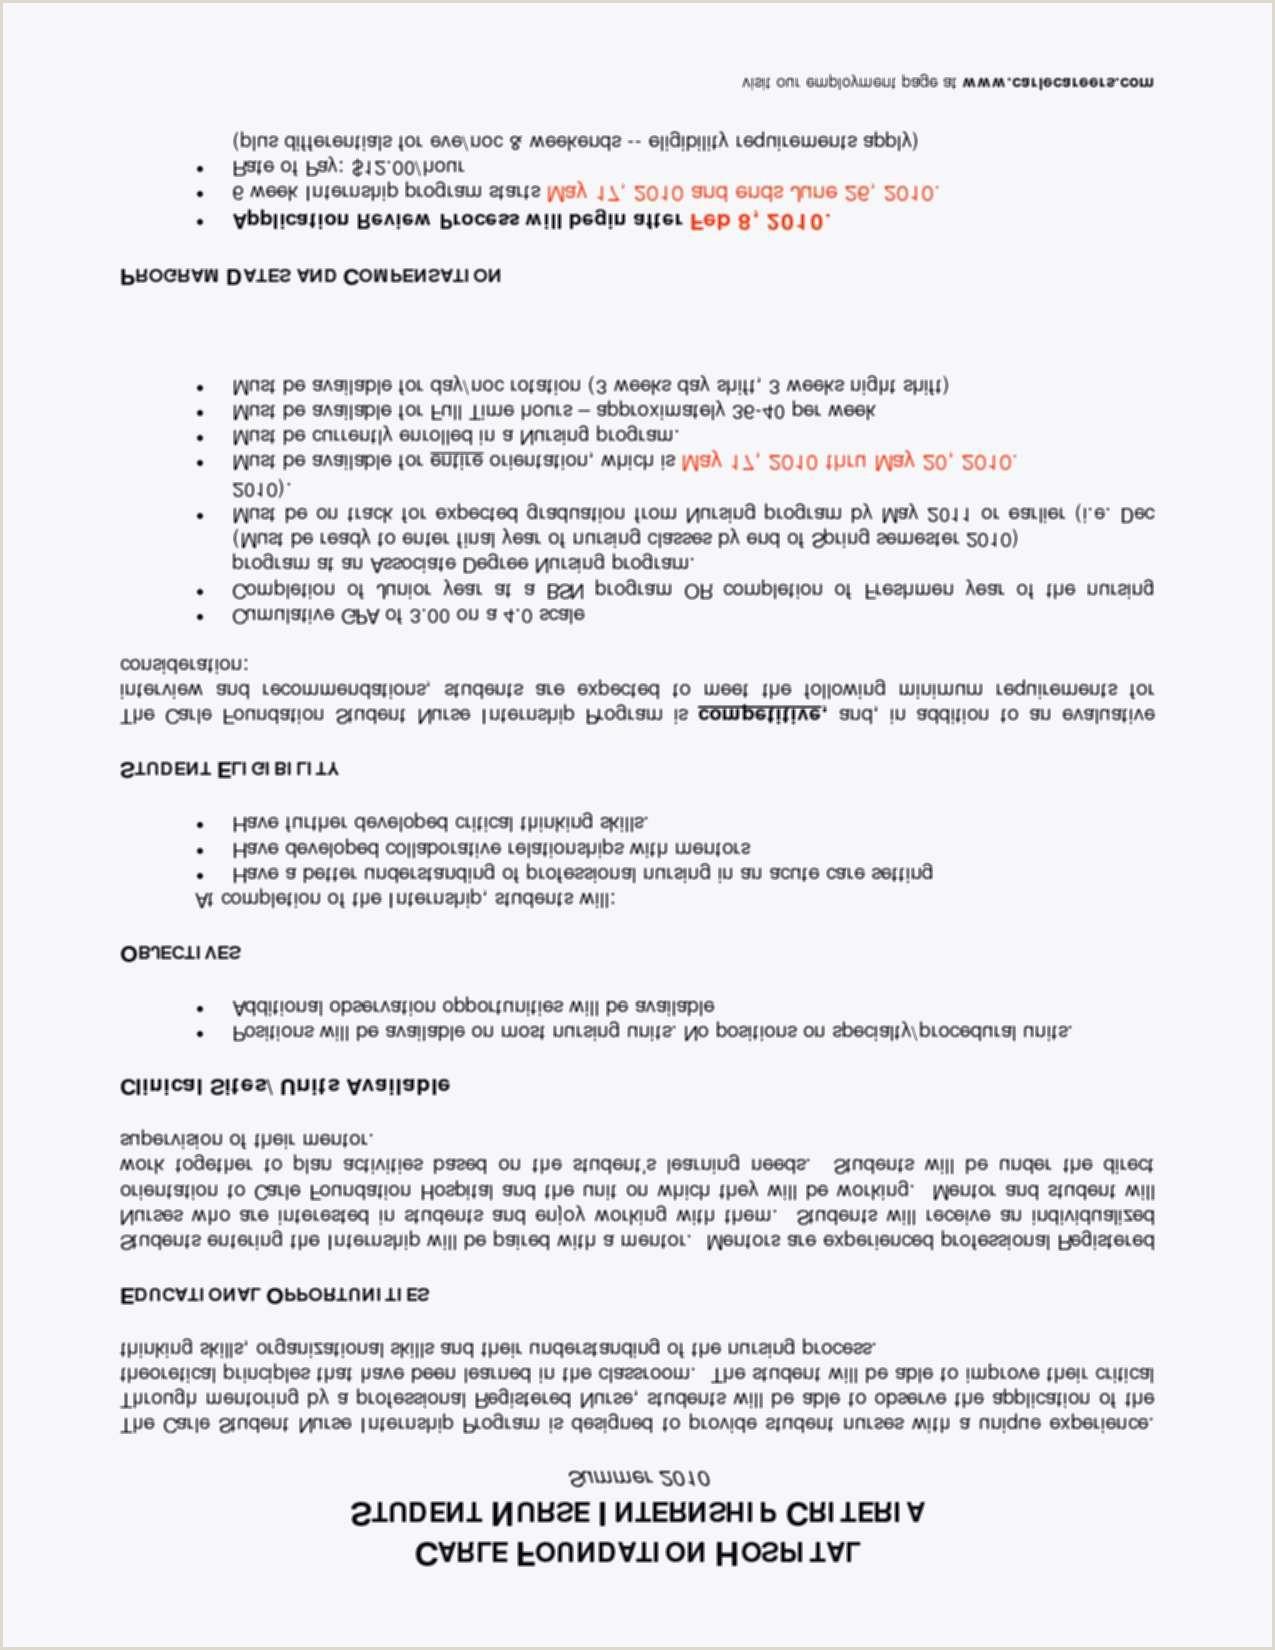 Exemple De Bon Cv Pdf Un Bon Cv échantillon Faire Un Bon Cv Frais Site Pour Faire